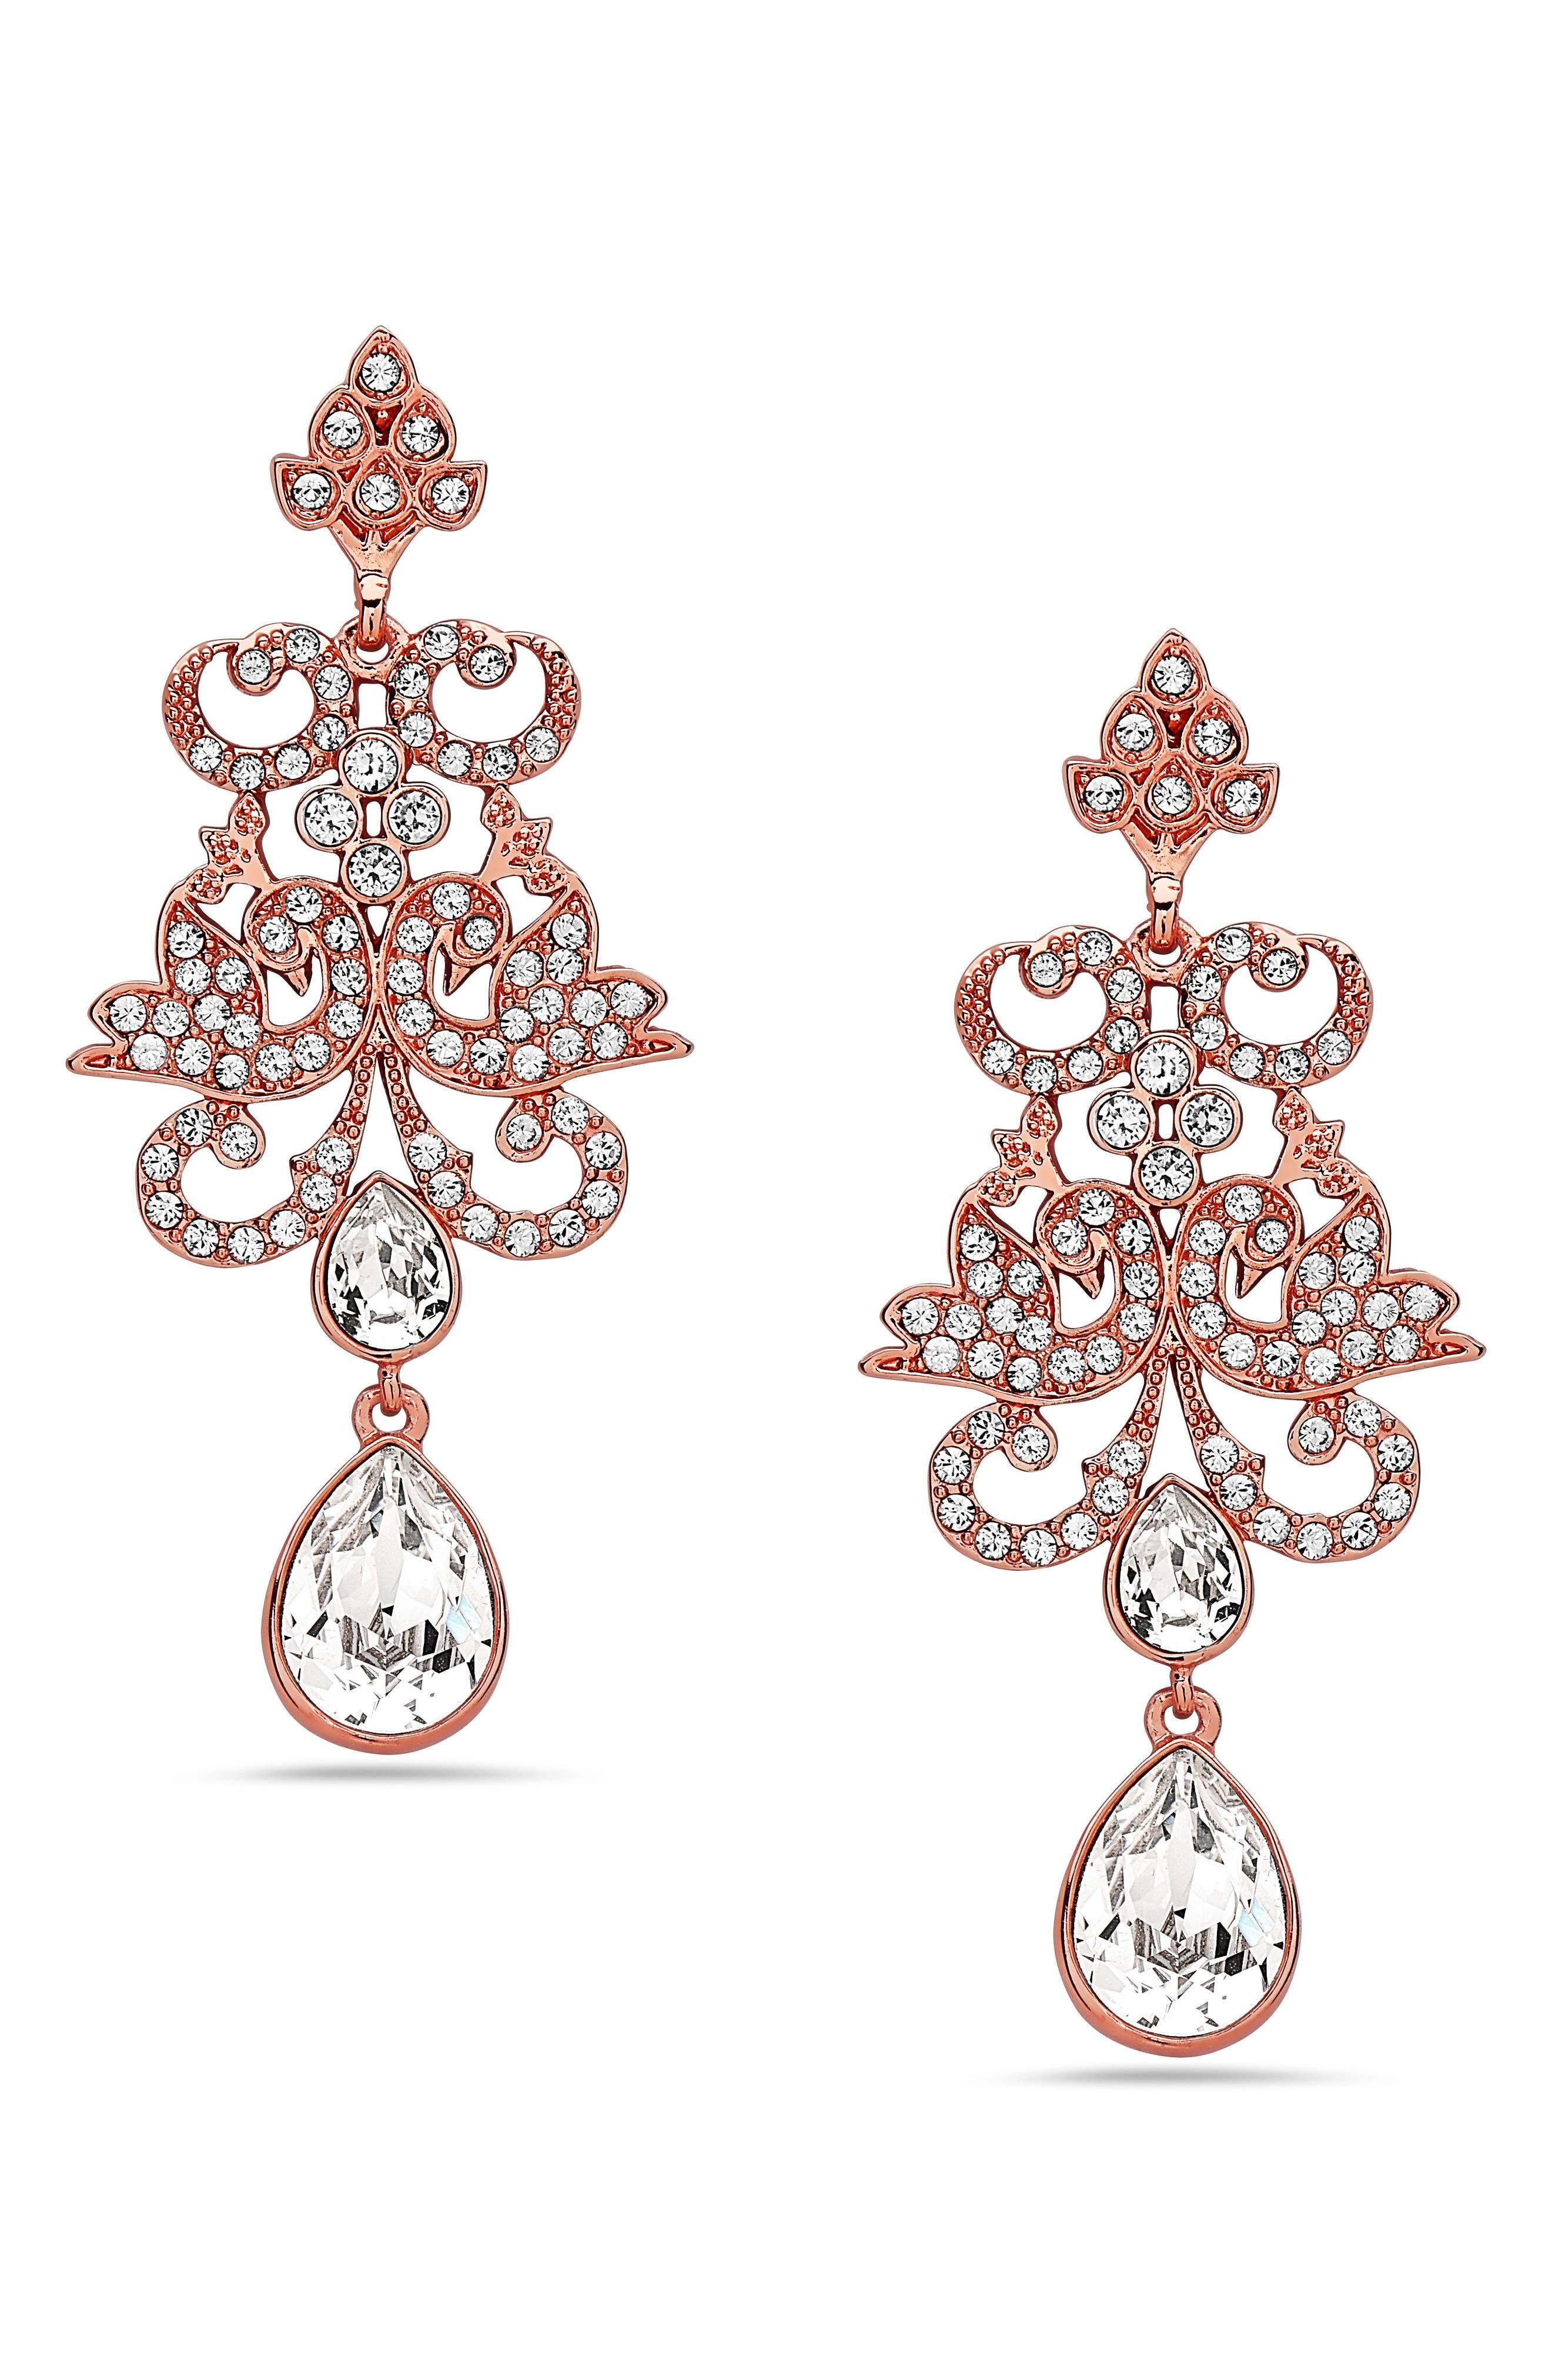 Swarovski Crystal Pear Drop Earrings,                             Main thumbnail 1, color,                             694